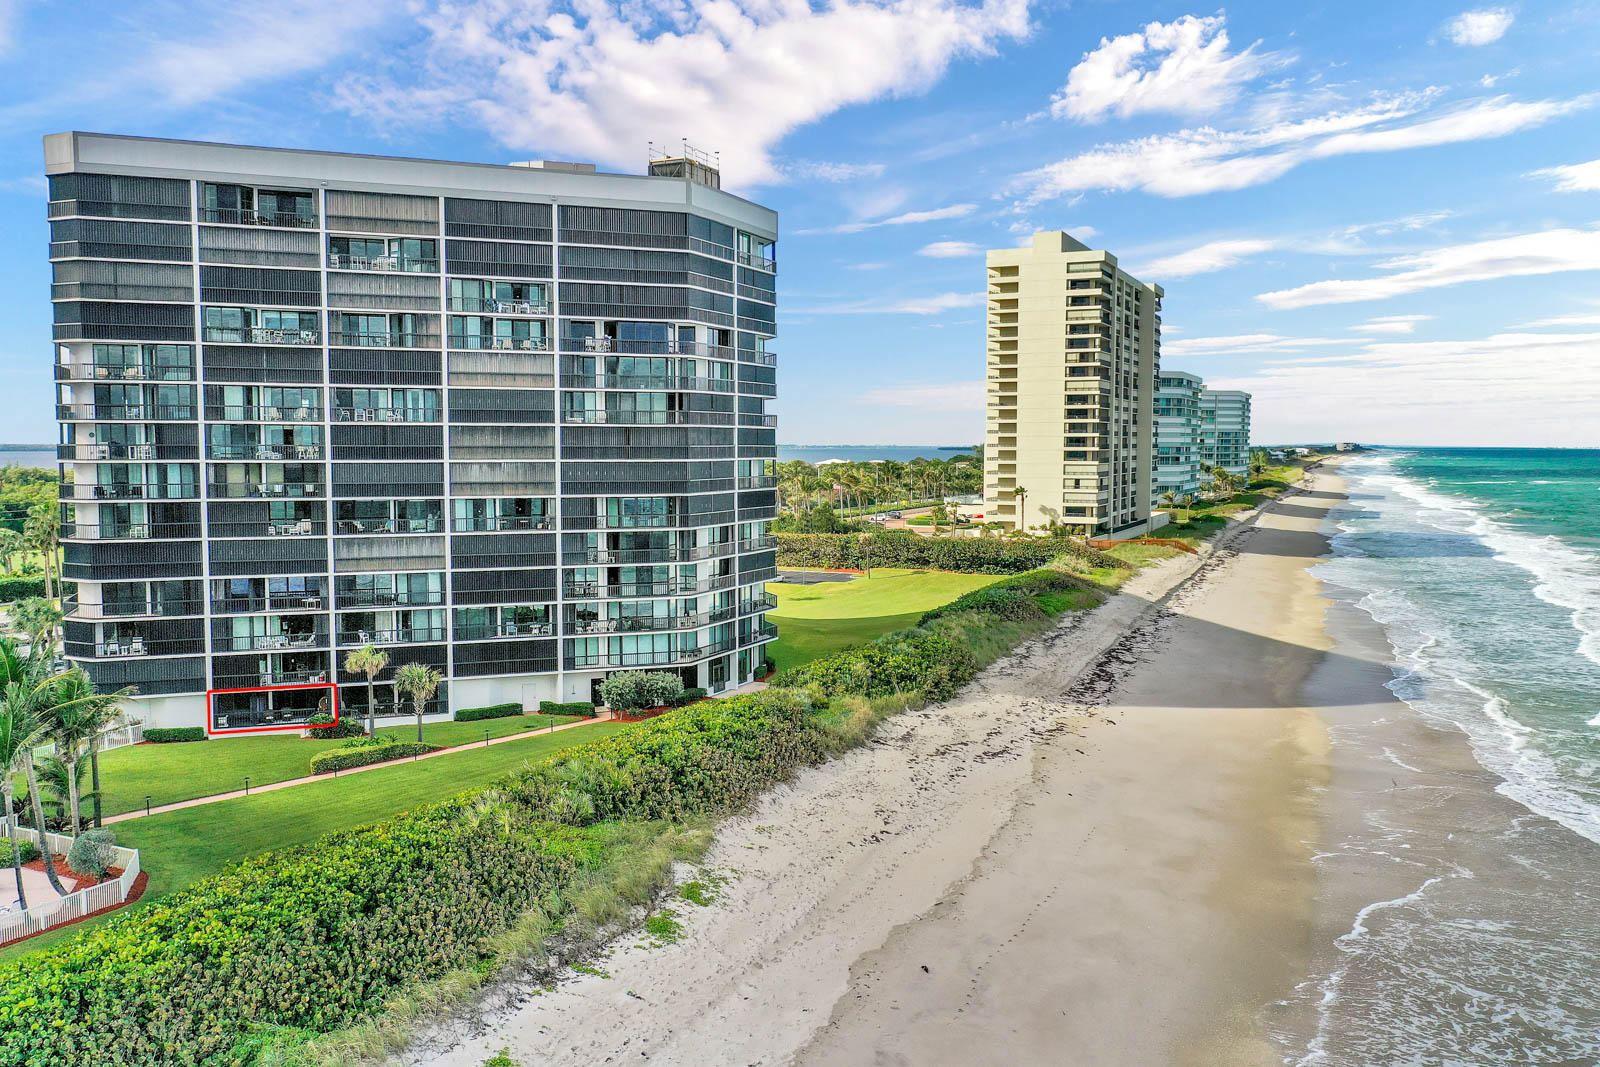 Photo of 8800 S Ocean Drive #109, Jensen Beach, FL 34957 (MLS # RX-10675855)